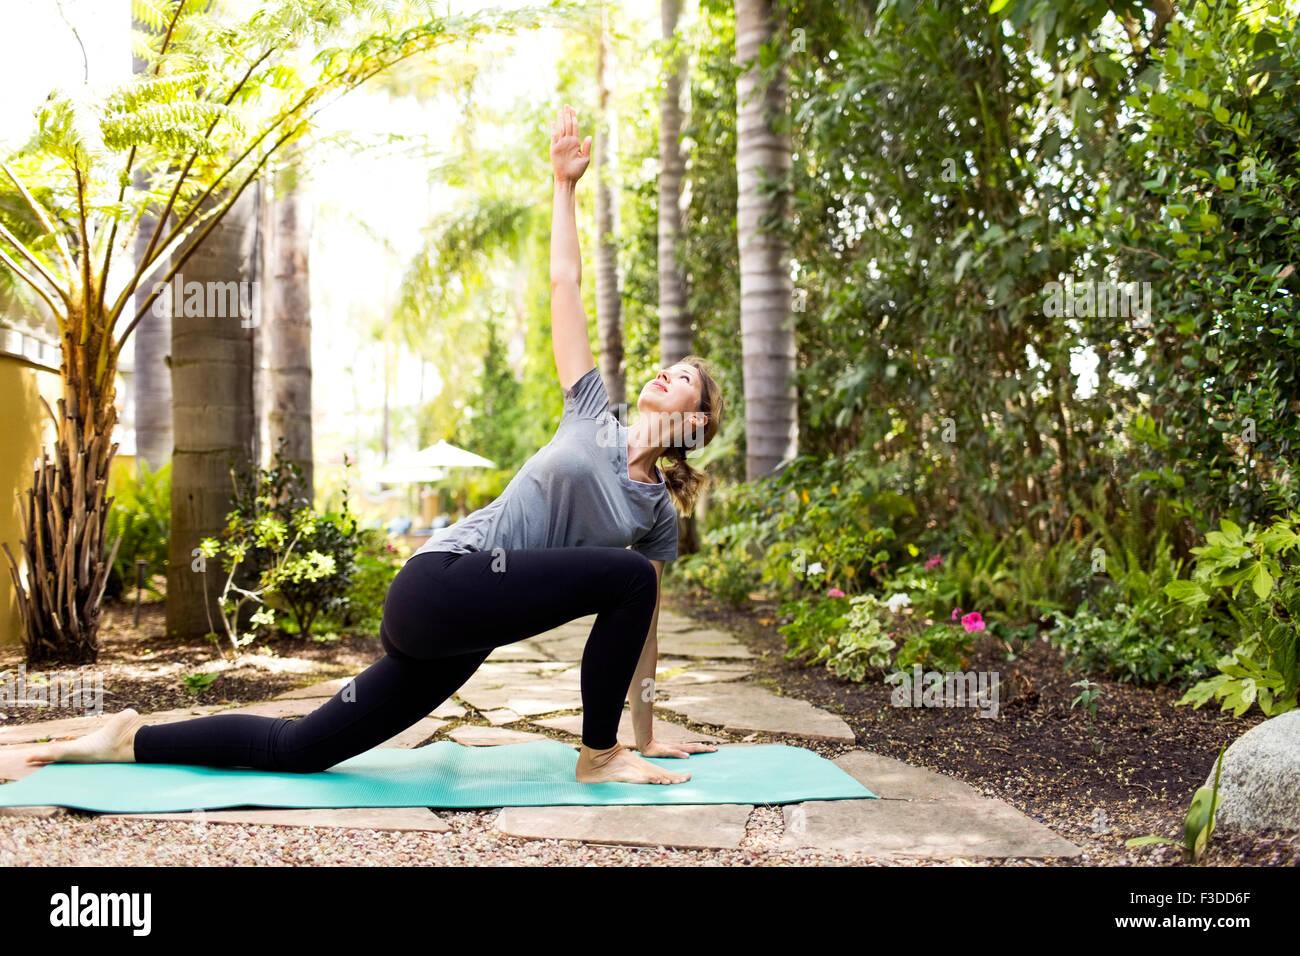 Frau Yoga zu praktizieren Stockbild